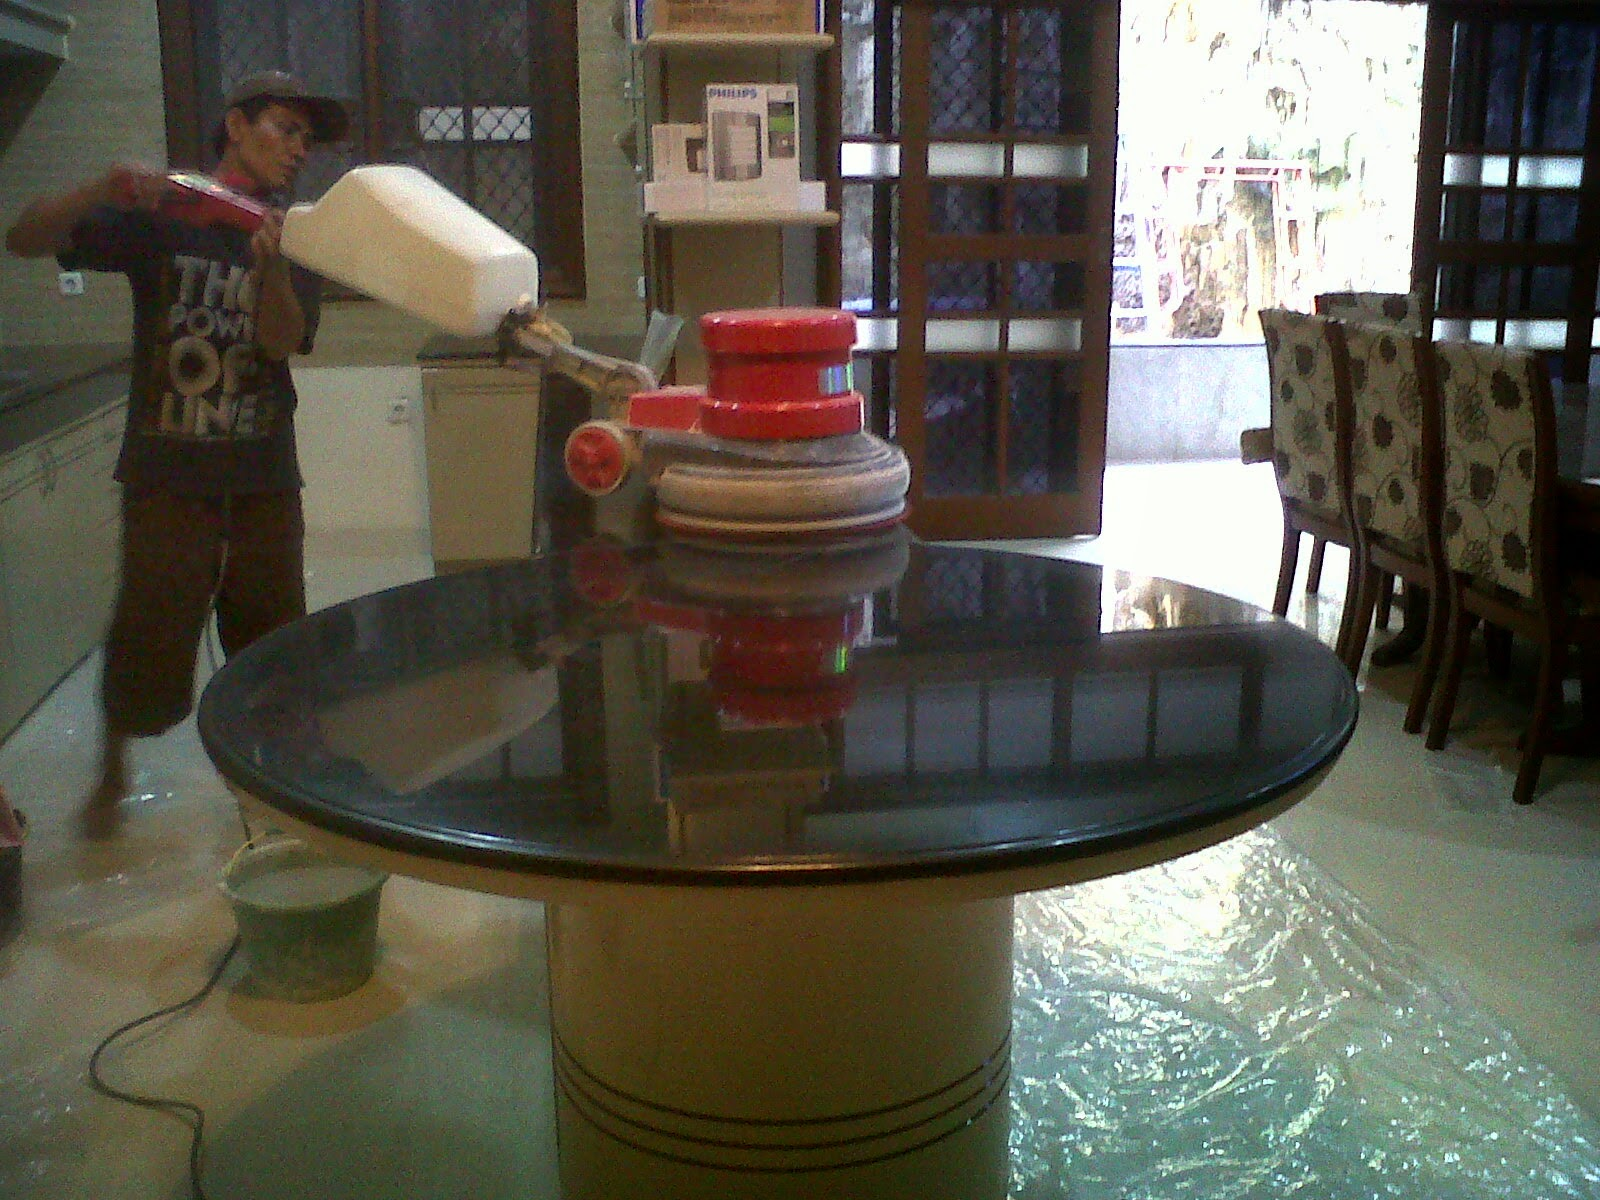 Poles Marmer Sawah Besar Jakarta Pusat